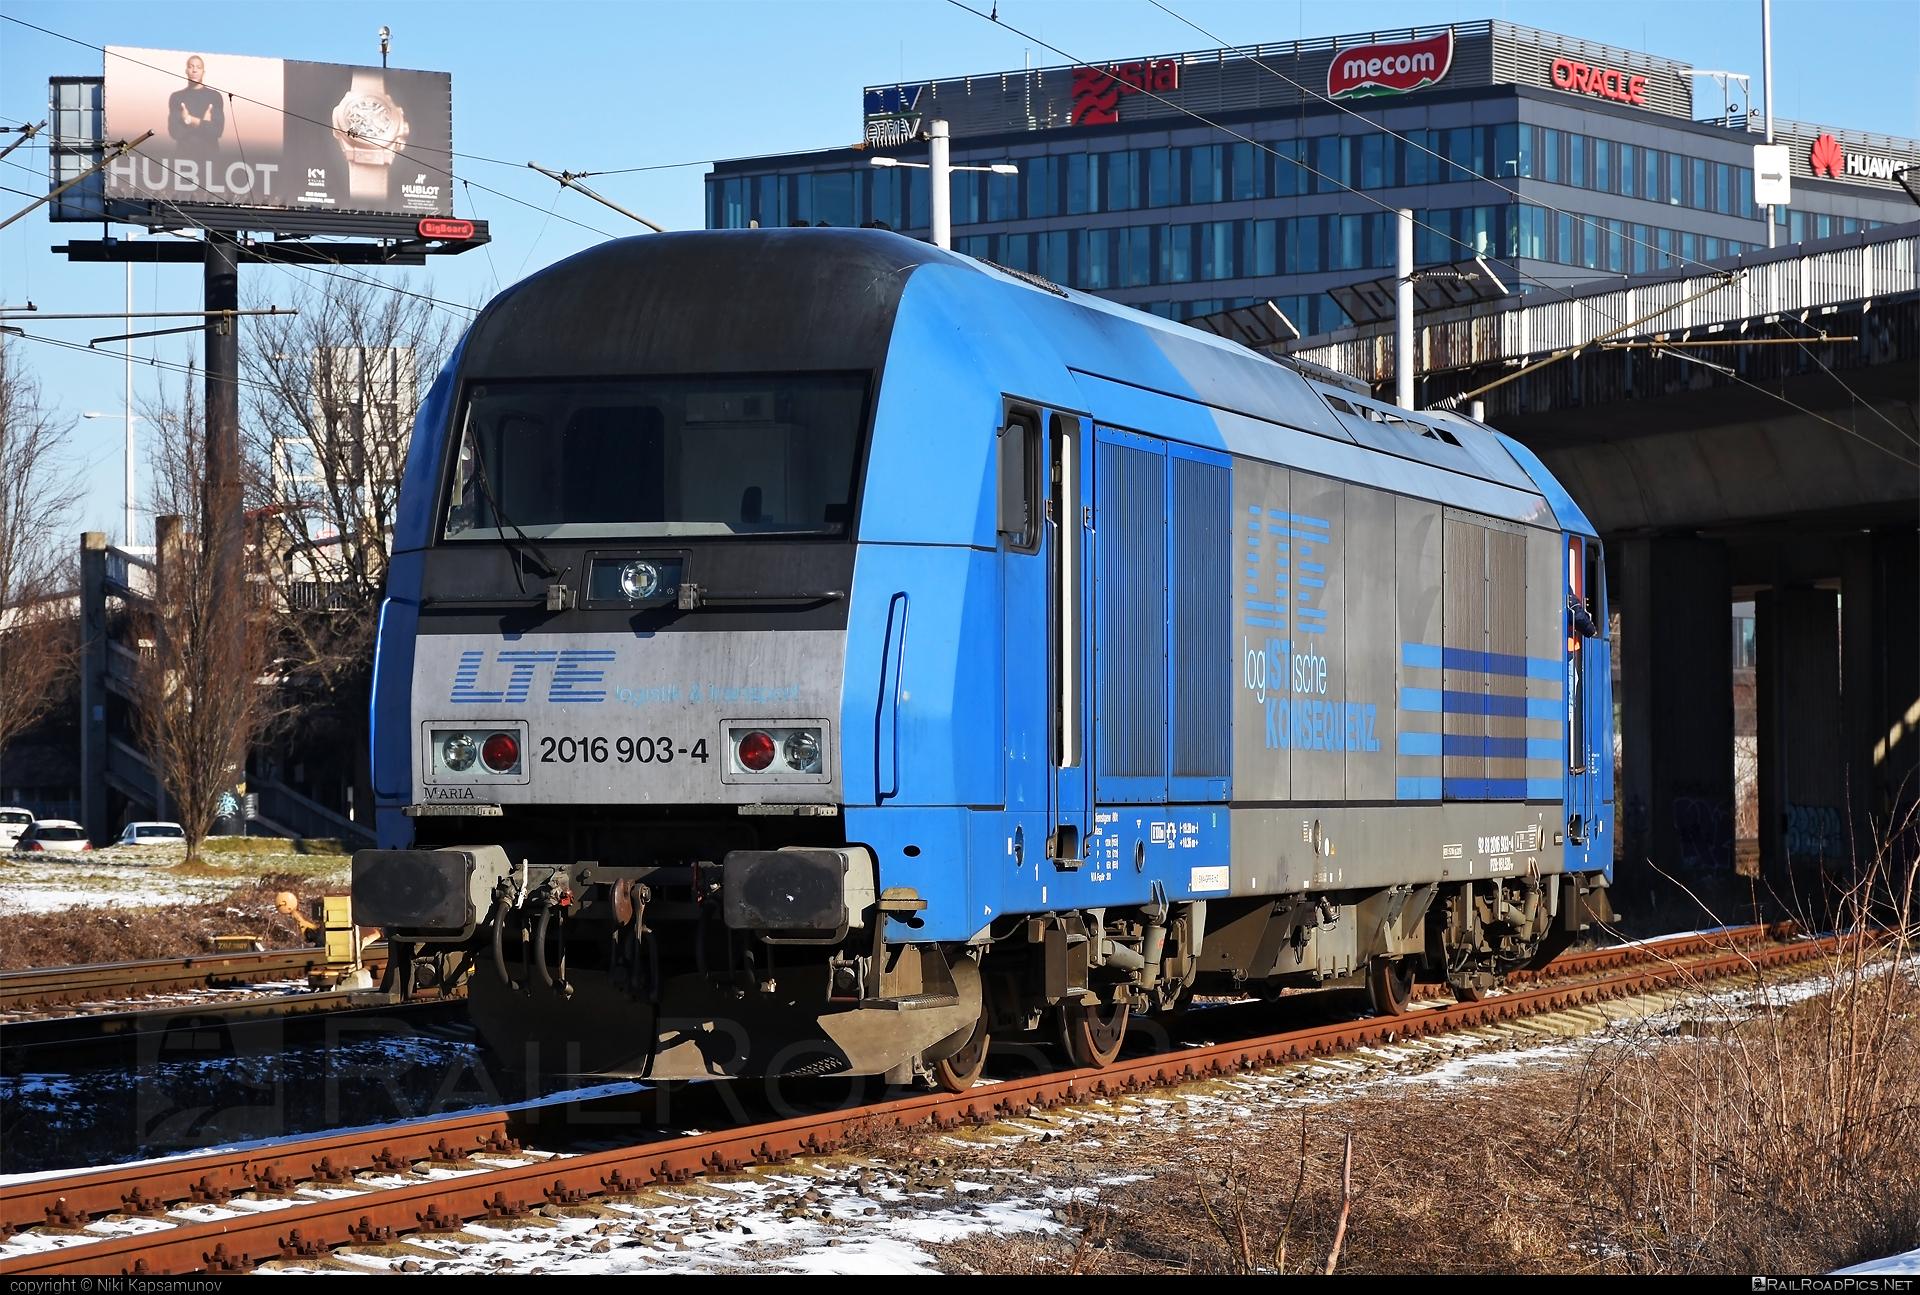 Siemens ER20 - 2016 903-4 operated by LTE Logistik und Transport GmbH #er20 #er20hercules #eurorunner #hercules #lte #ltelogistikundtransport #ltelogistikundtransportgmbh #siemens #siemenser20 #siemenser20hercules #siemenseurorunner #siemenshercules